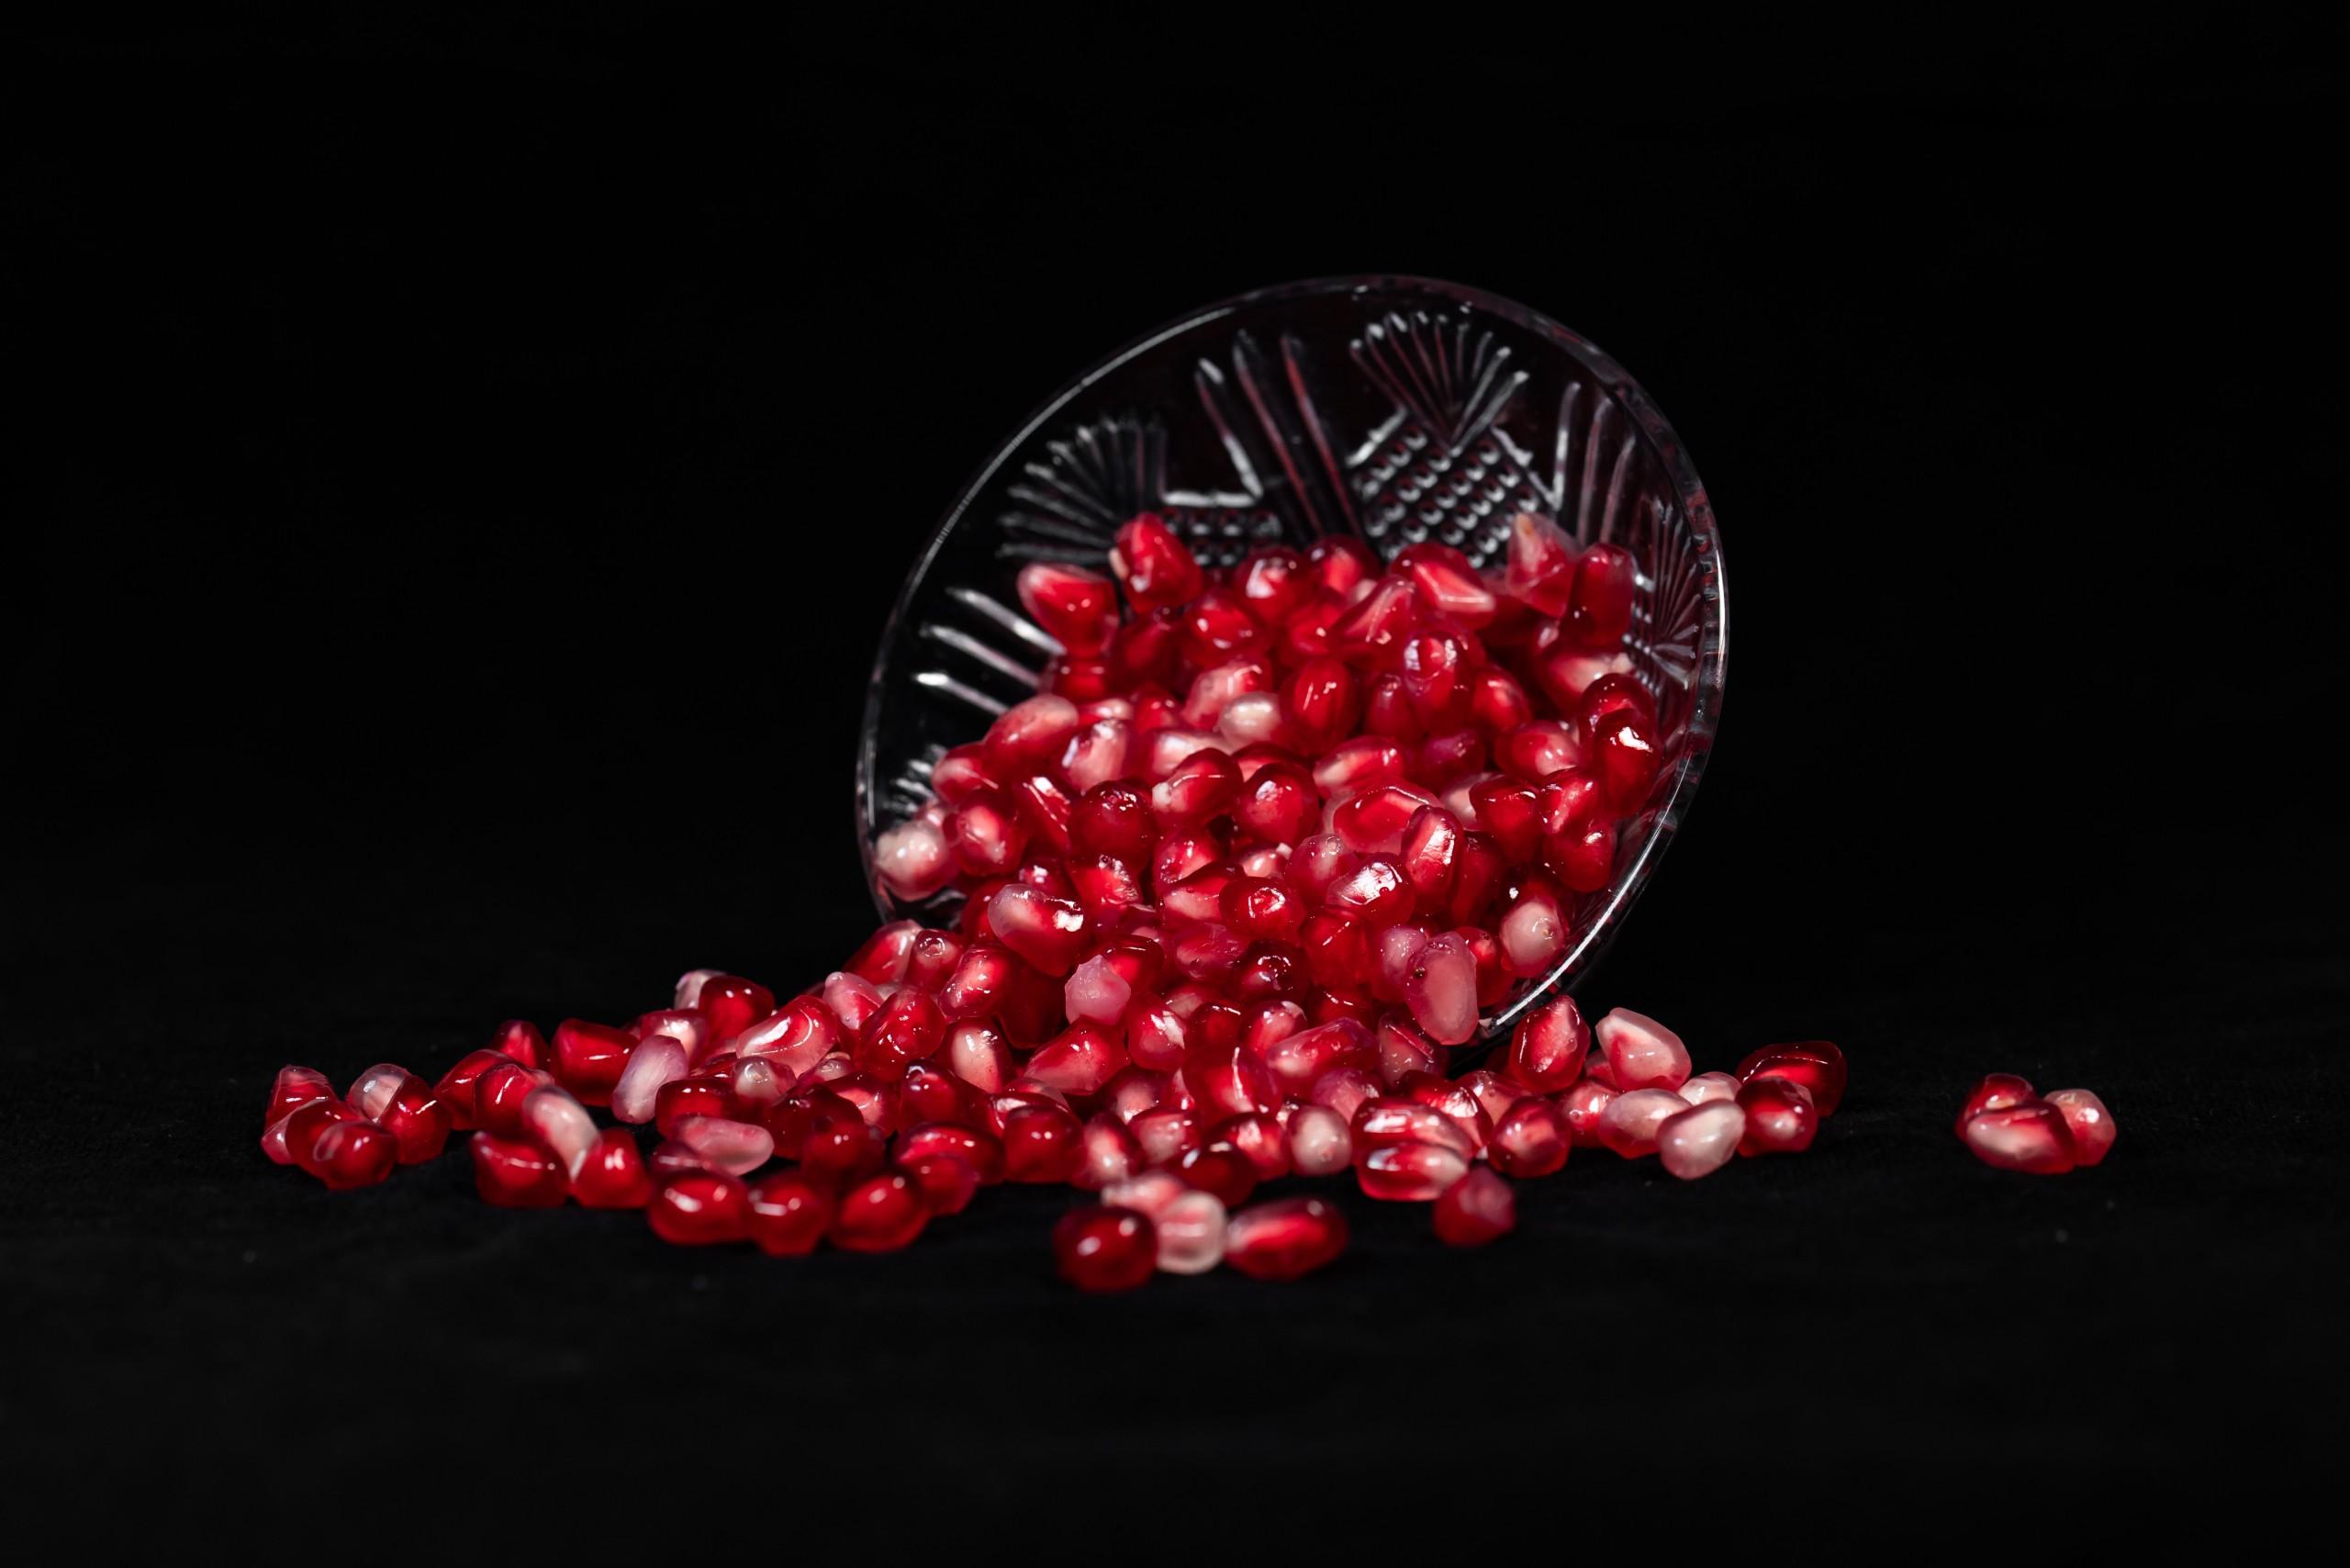 Pomegranate in Bowl